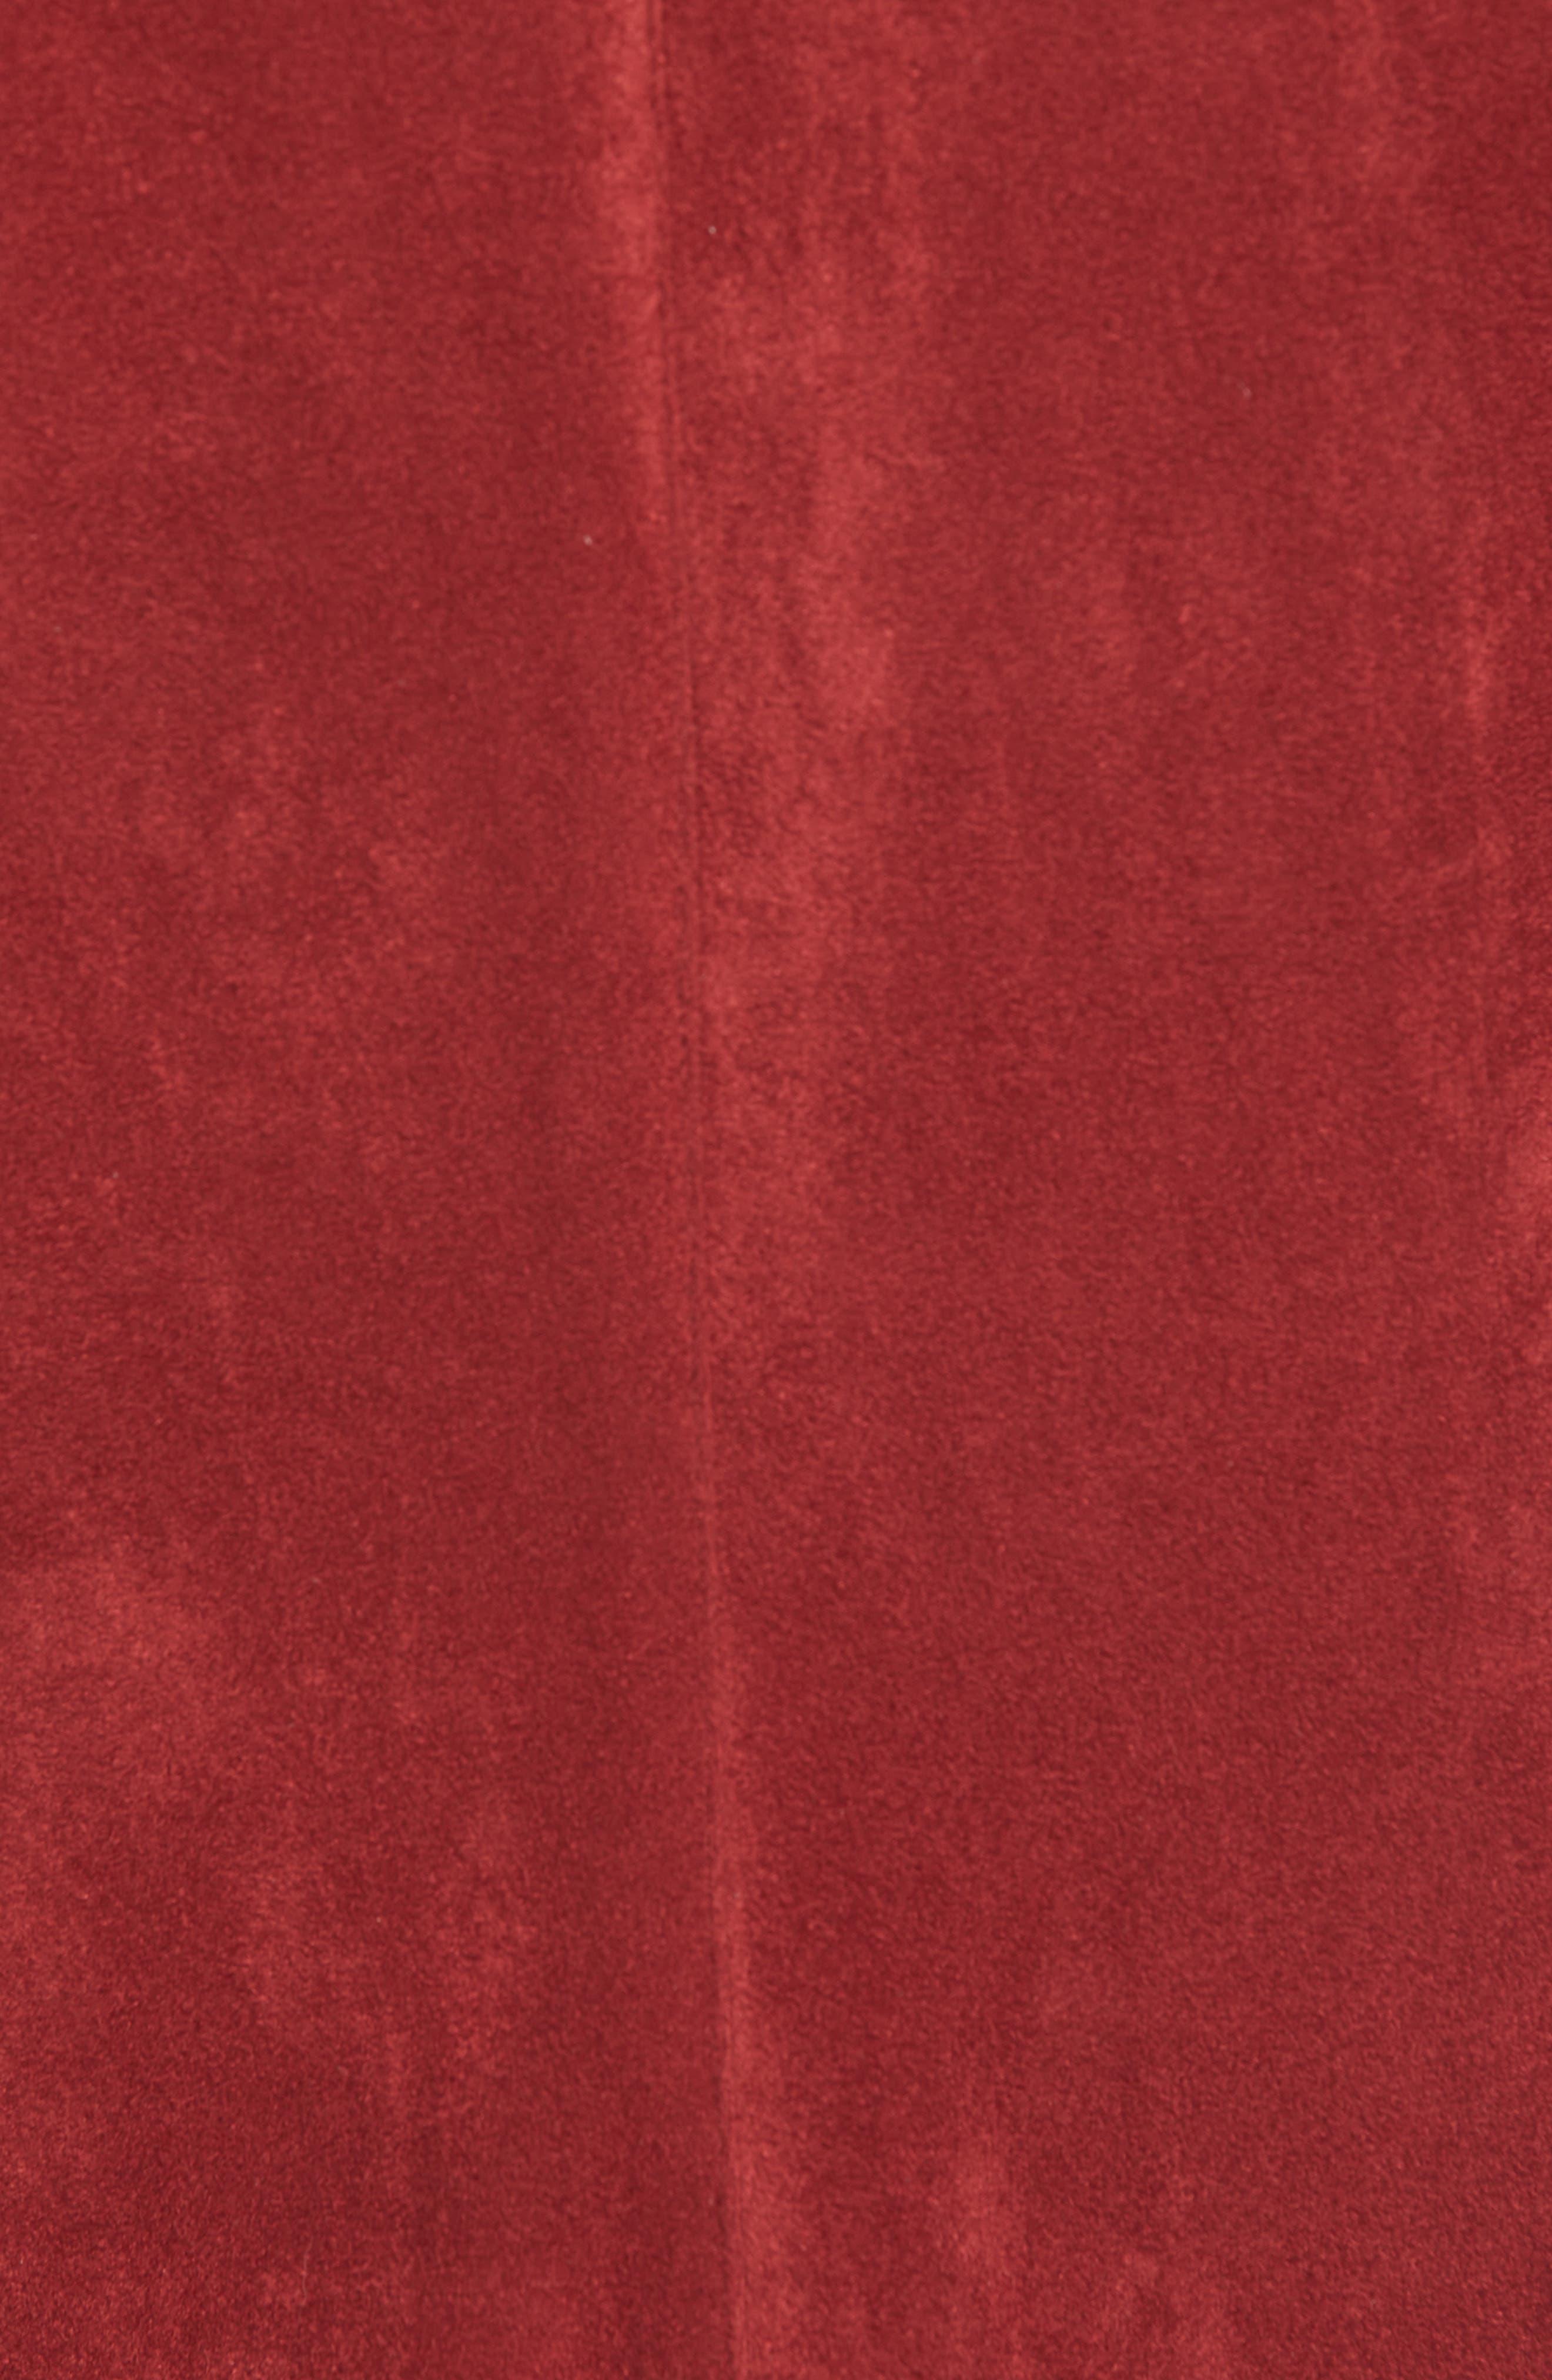 BB DAKOTA,                             Nicholson Faux Suede Drape Front Jacket,                             Alternate thumbnail 7, color,                             BRICK RED